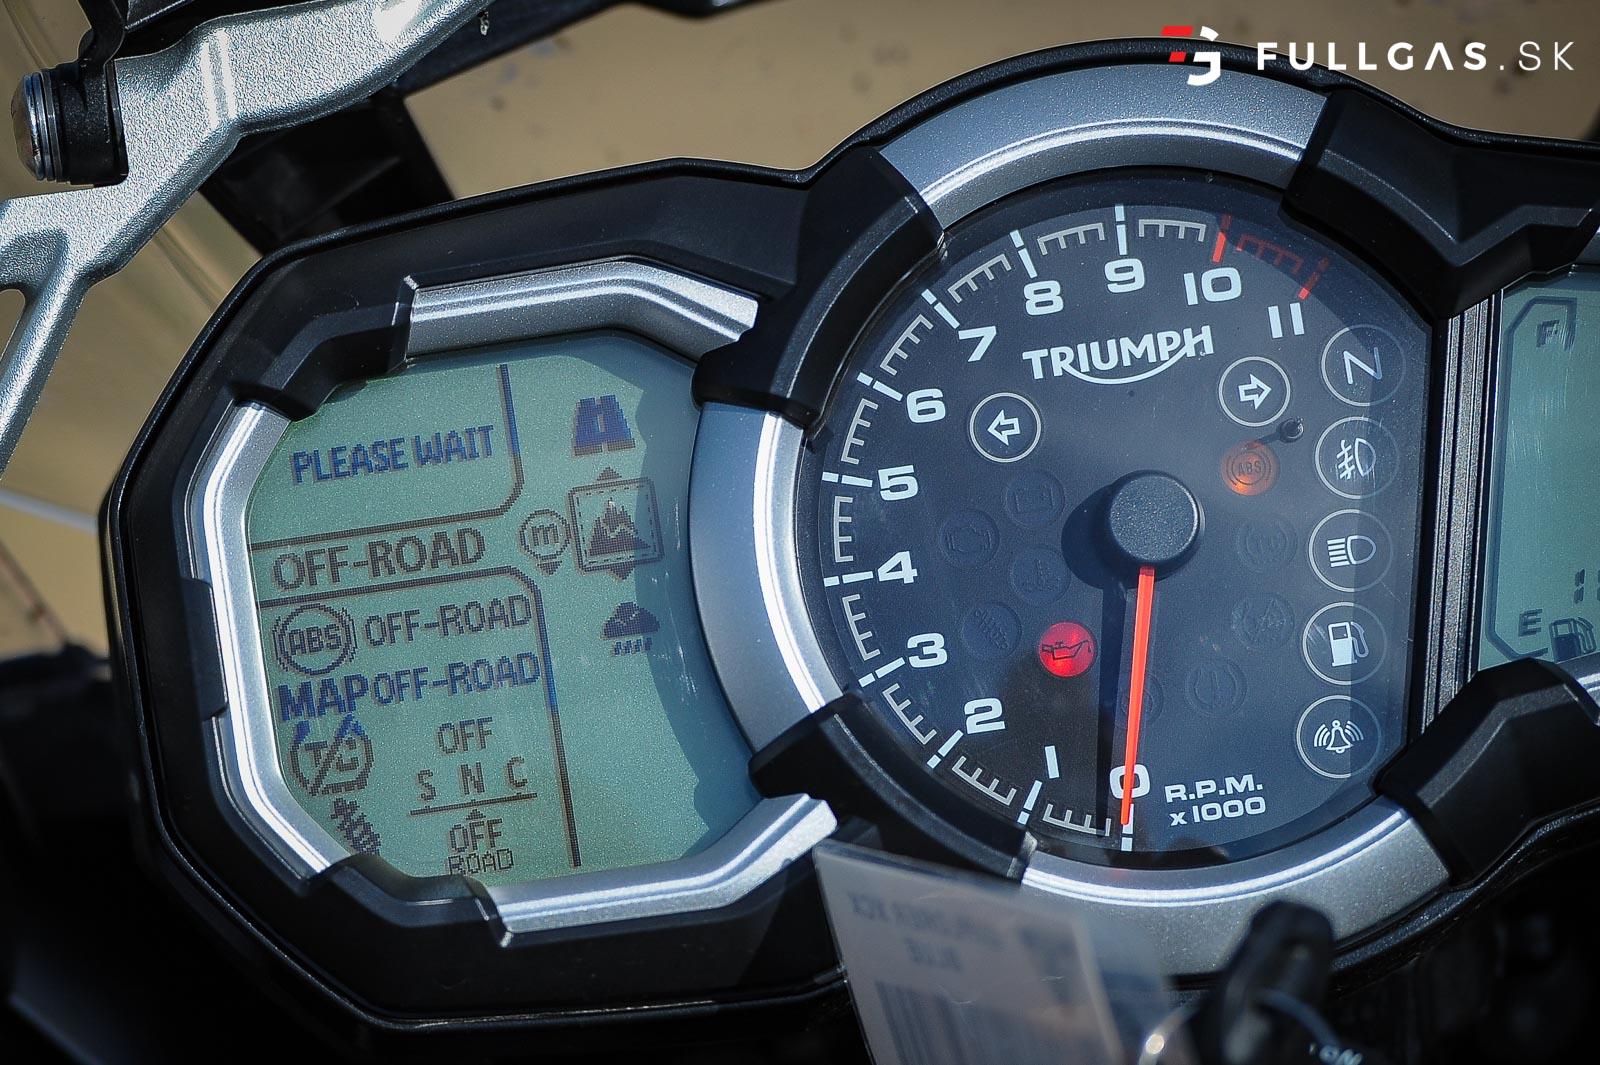 Triumph_Tiger_1200XC_fullgas.sk_0403